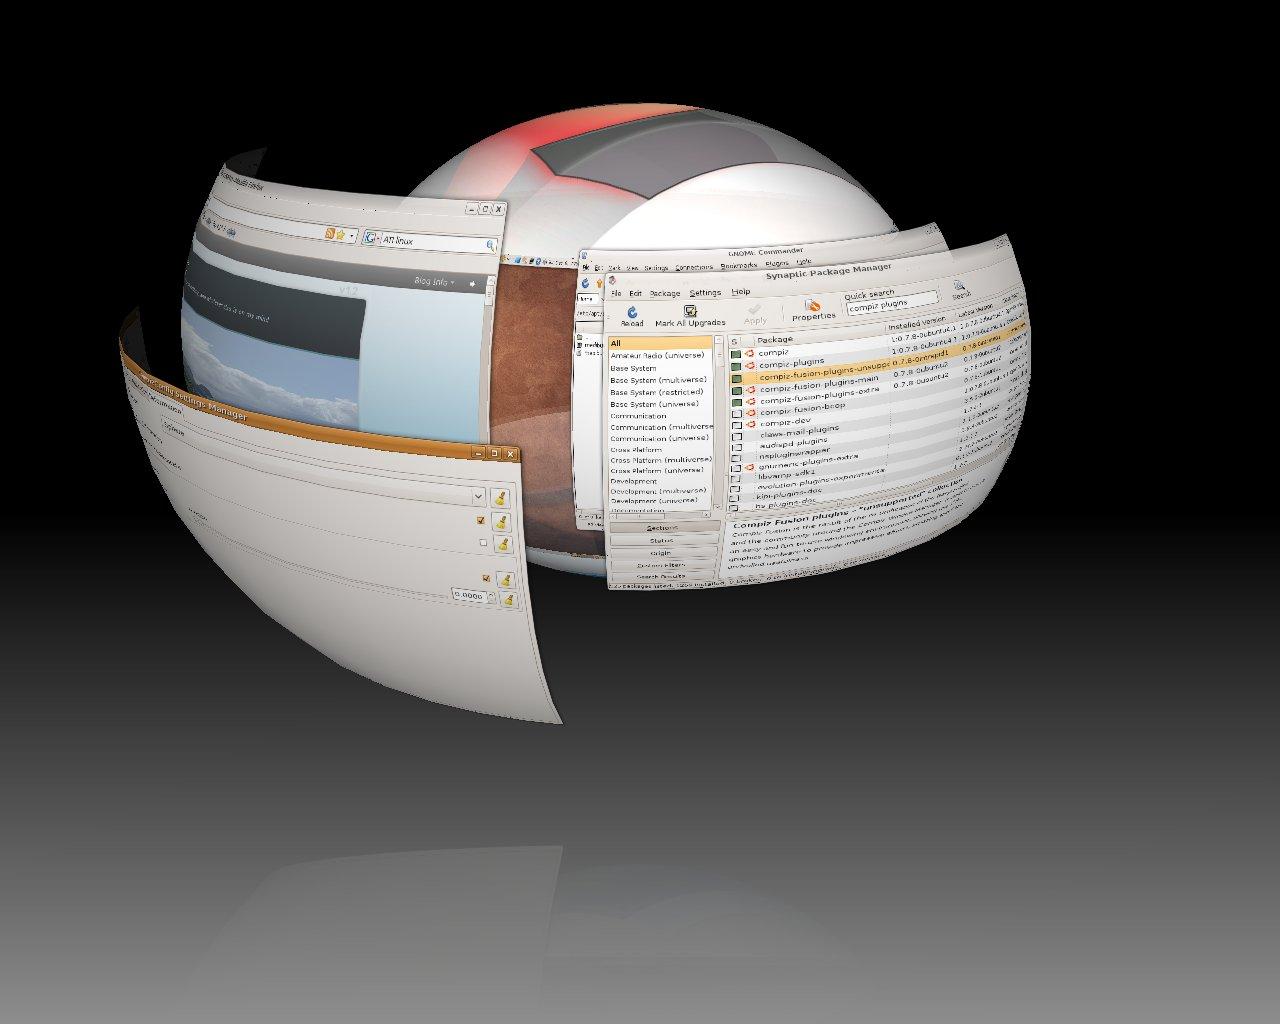 3D Desktop Cube